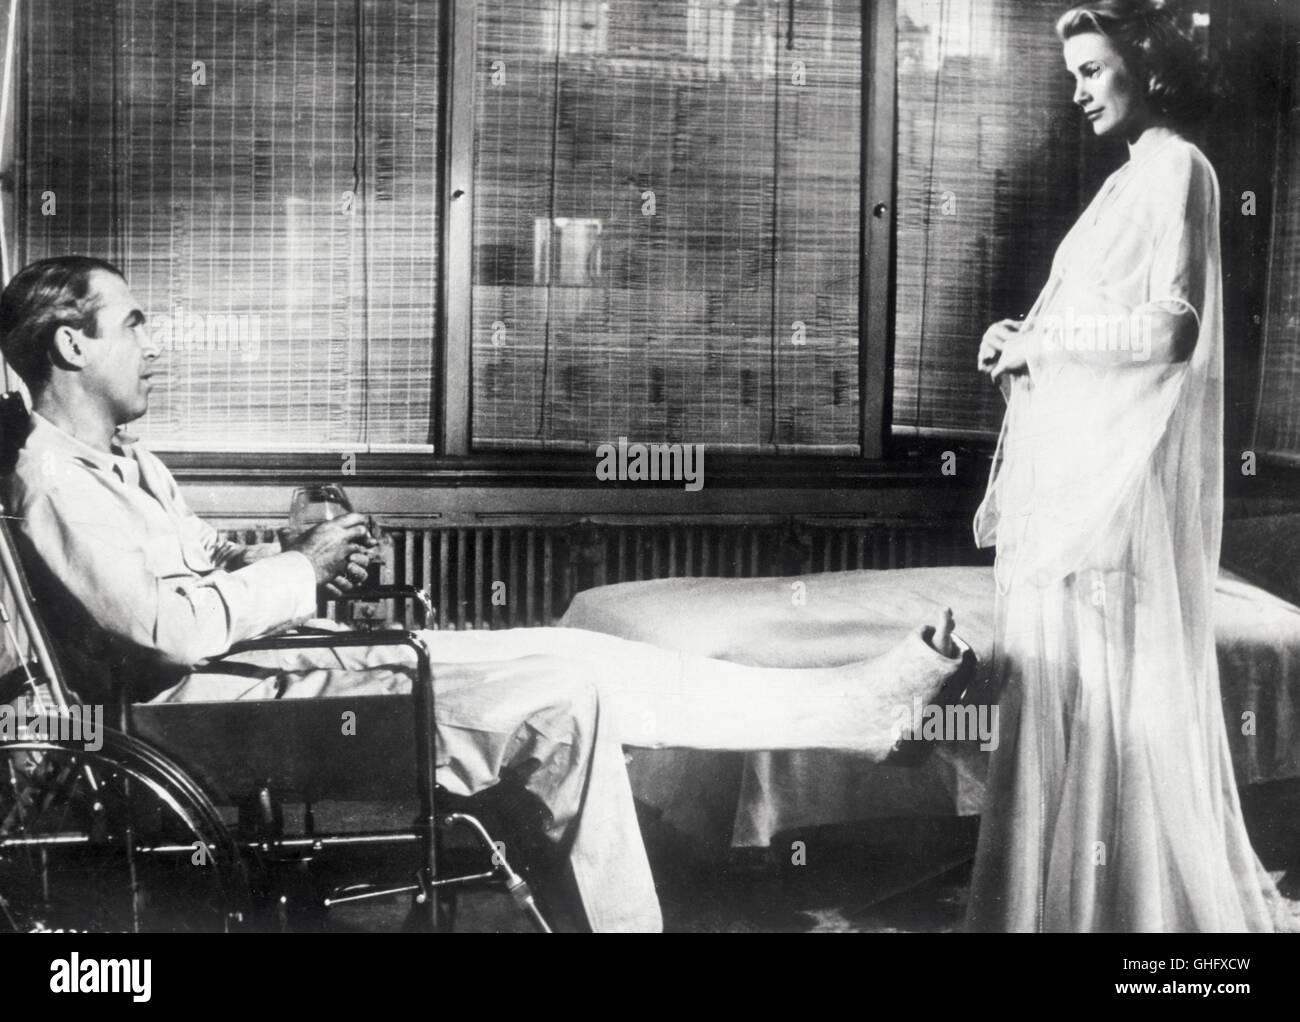 GRACE KELLY (Lisa Carol Fremont), JAMES STEWART (L.B. Jefferies) Regie: Alfred Hitchcock - Stock Image